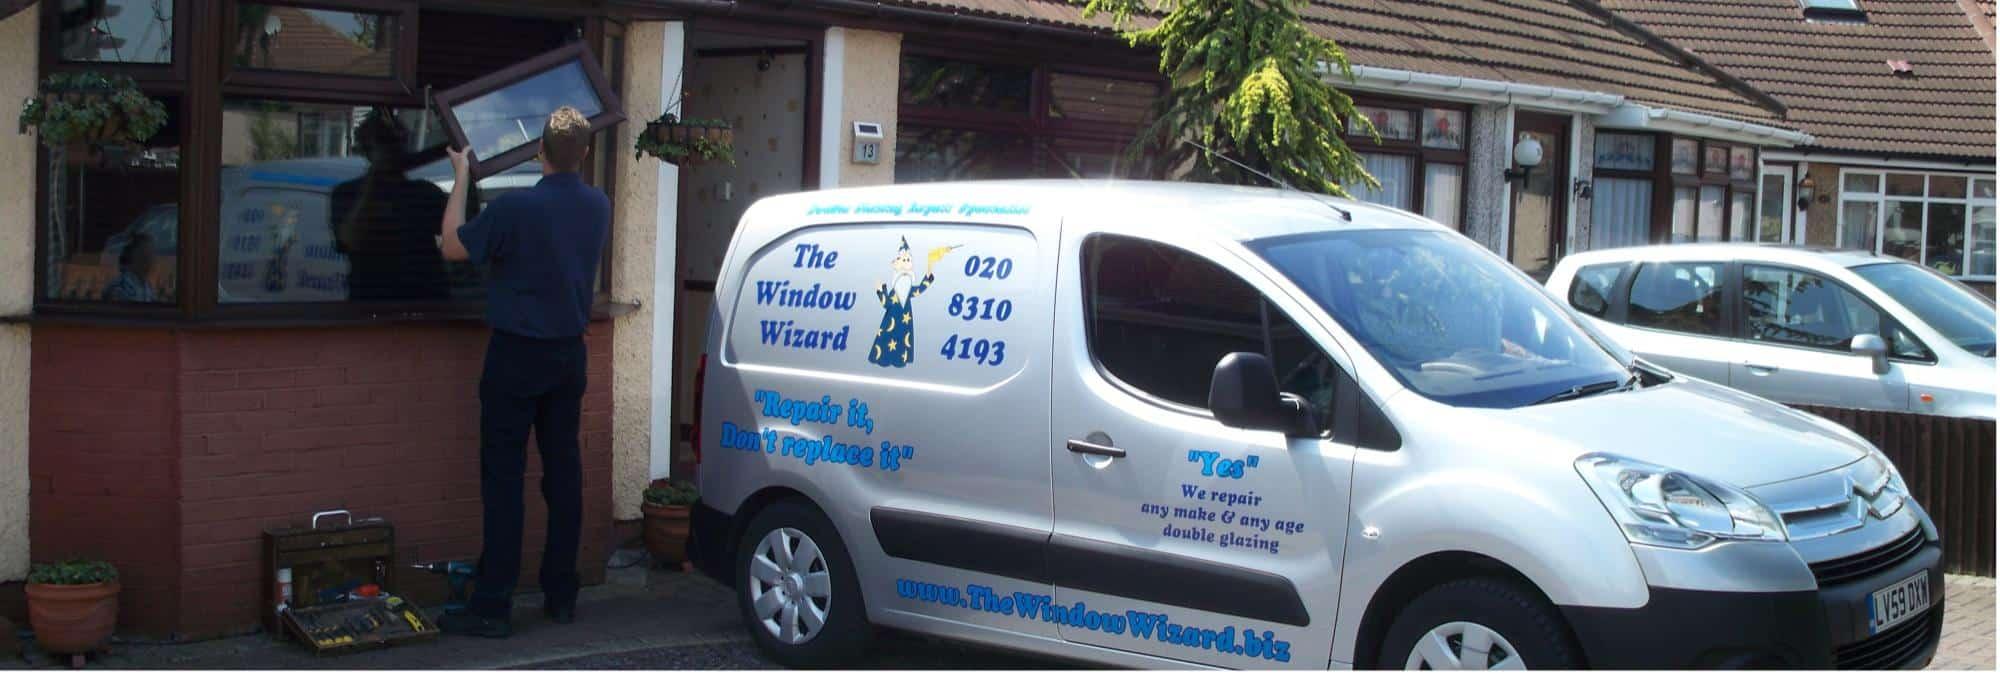 Double glazing local repair company